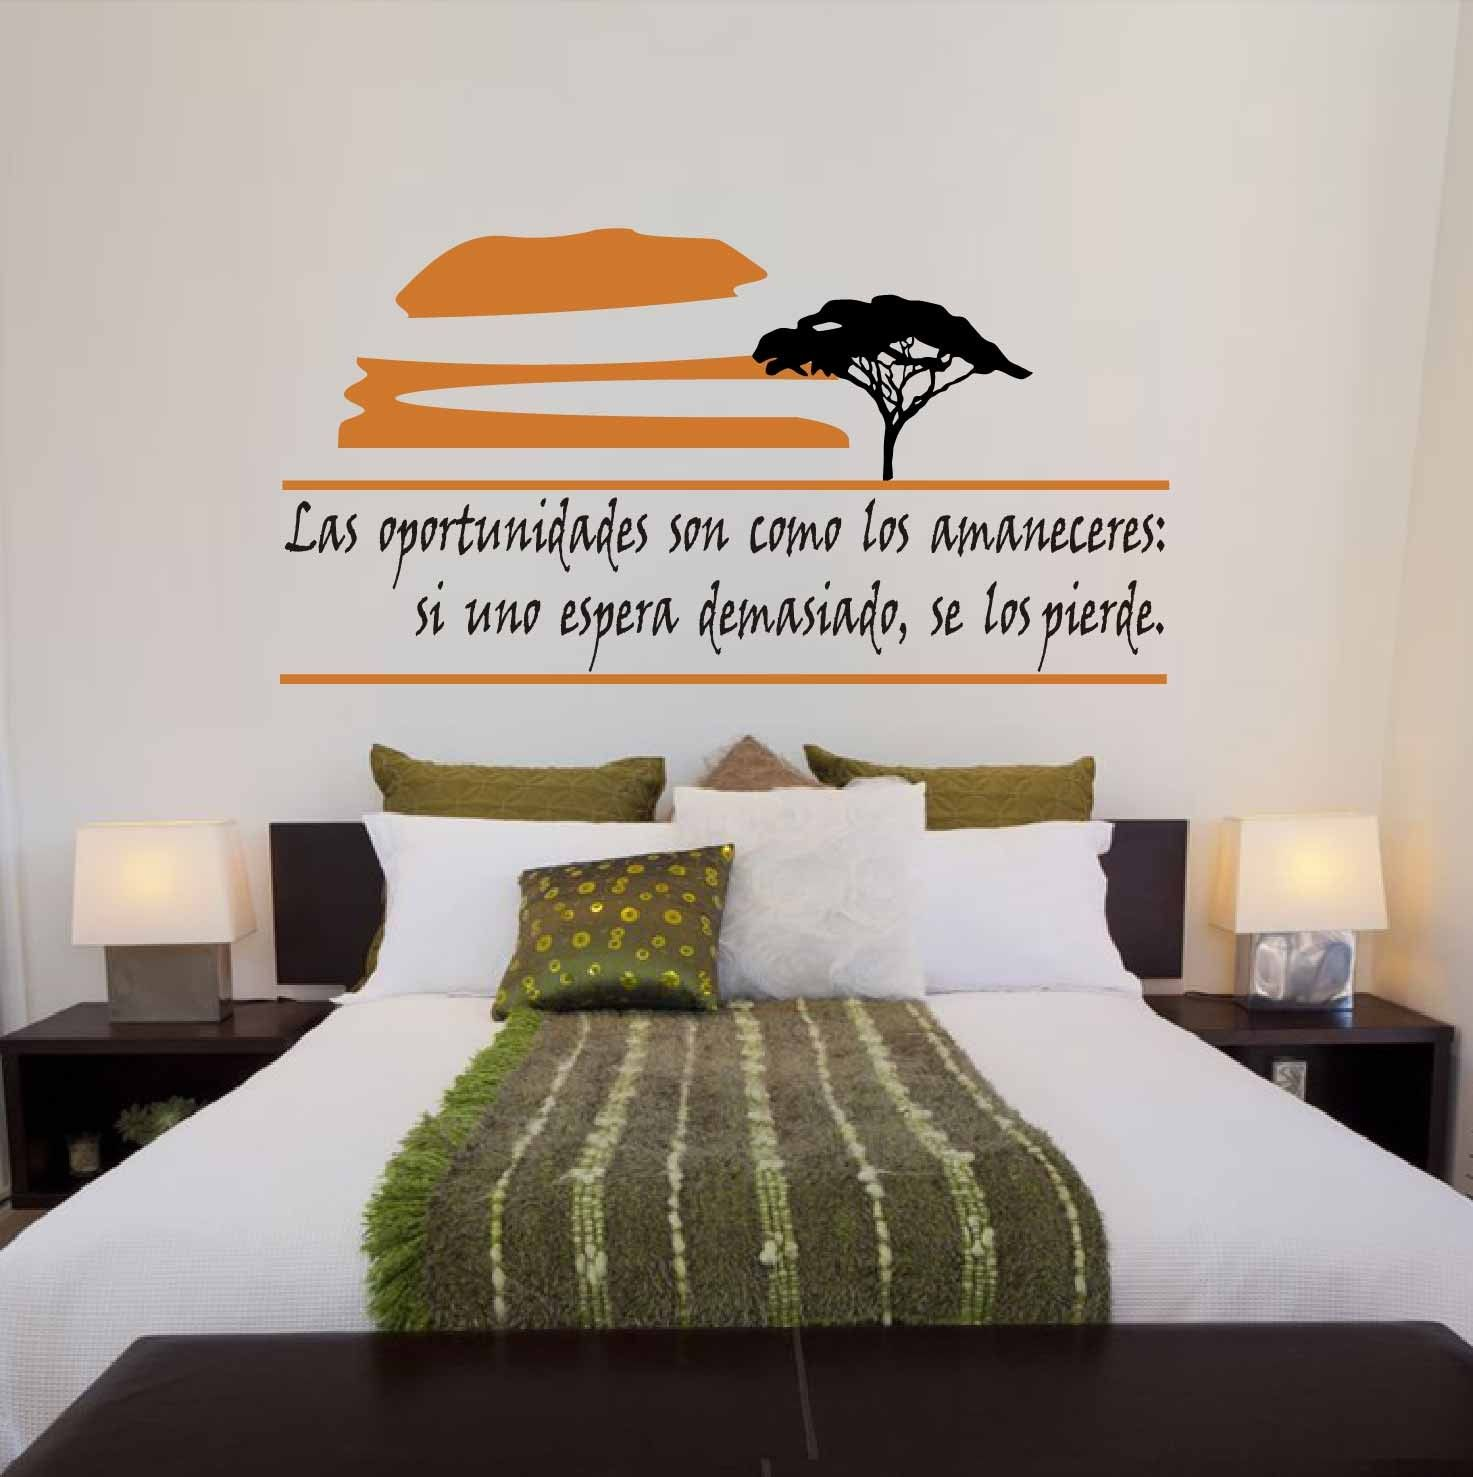 Frases en vinilo para pared decoracion de lujo pinterest for Vinilos pared frases